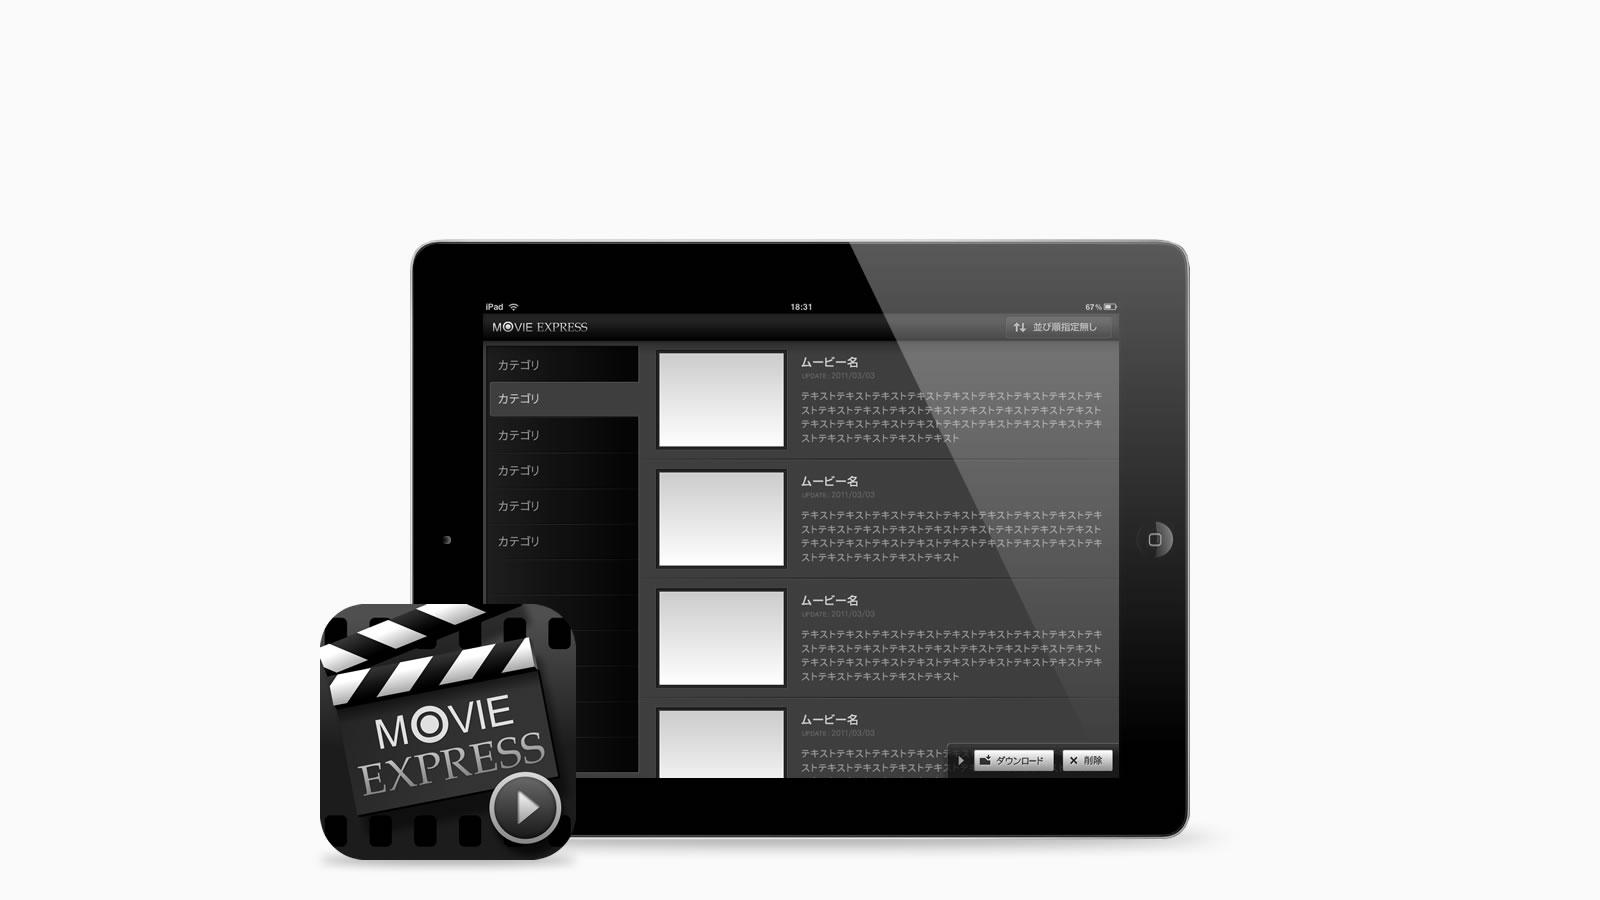 movieexpress001